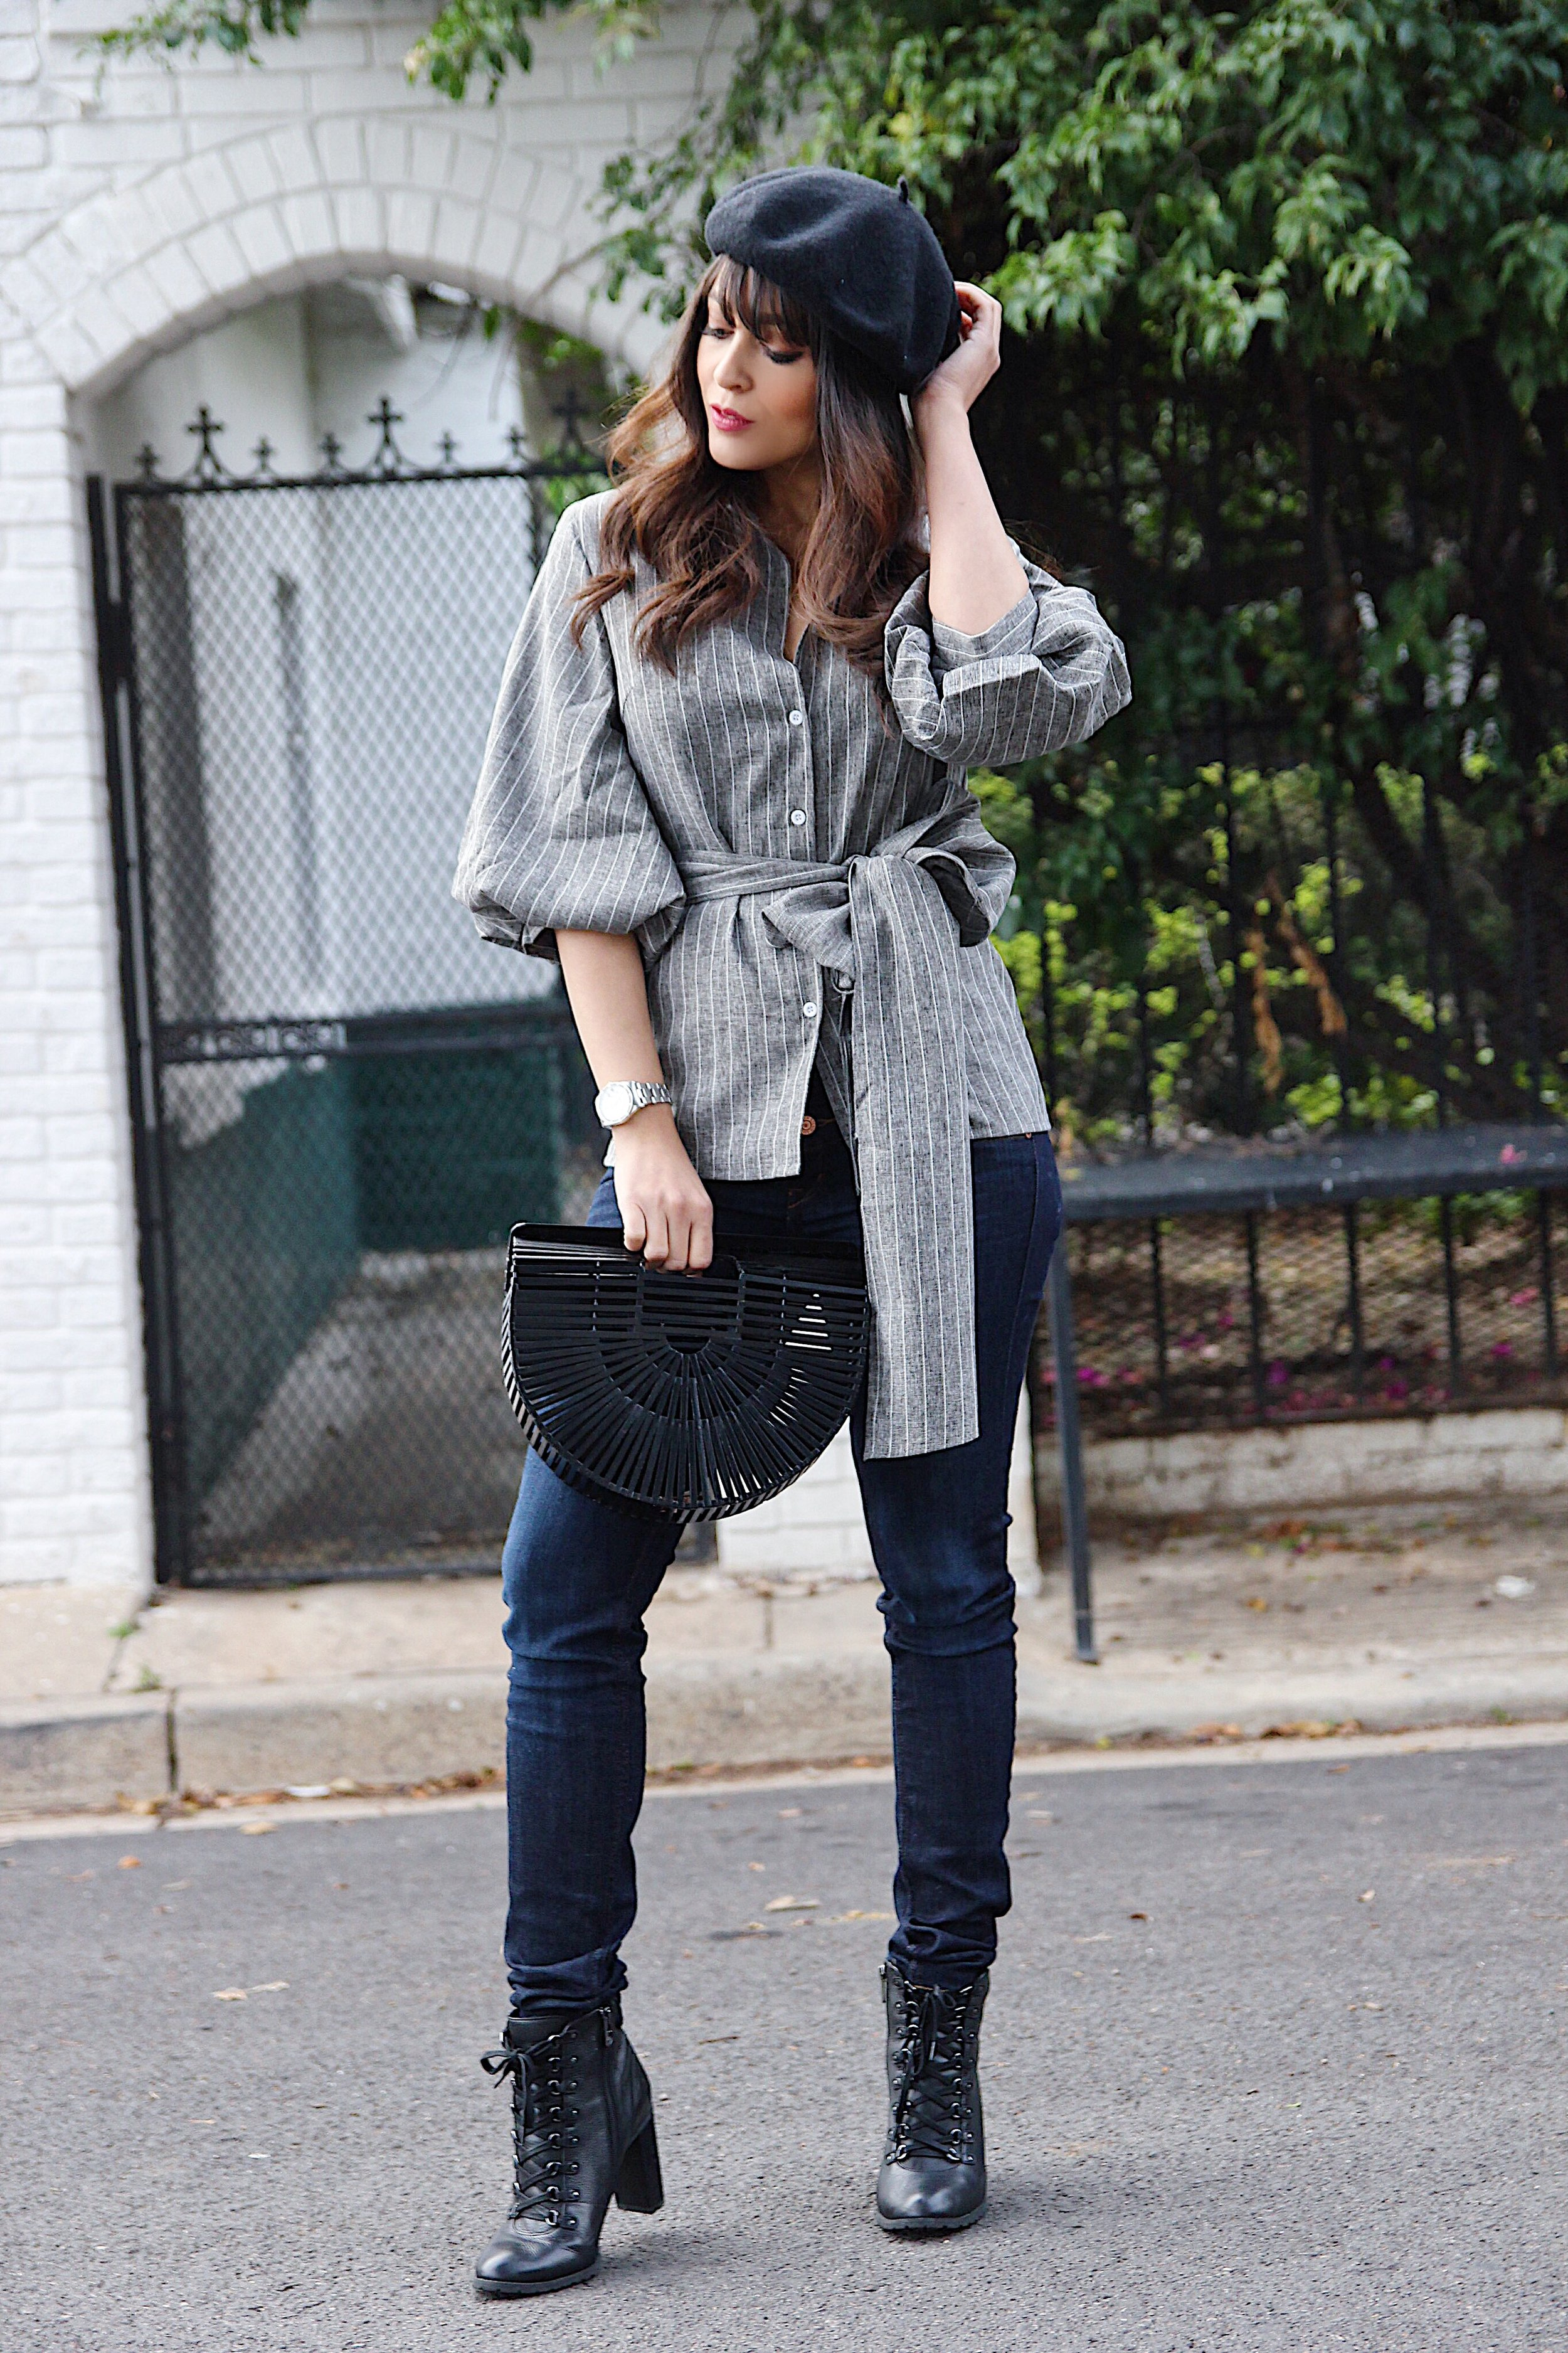 Fashion blogger Winter Fashion